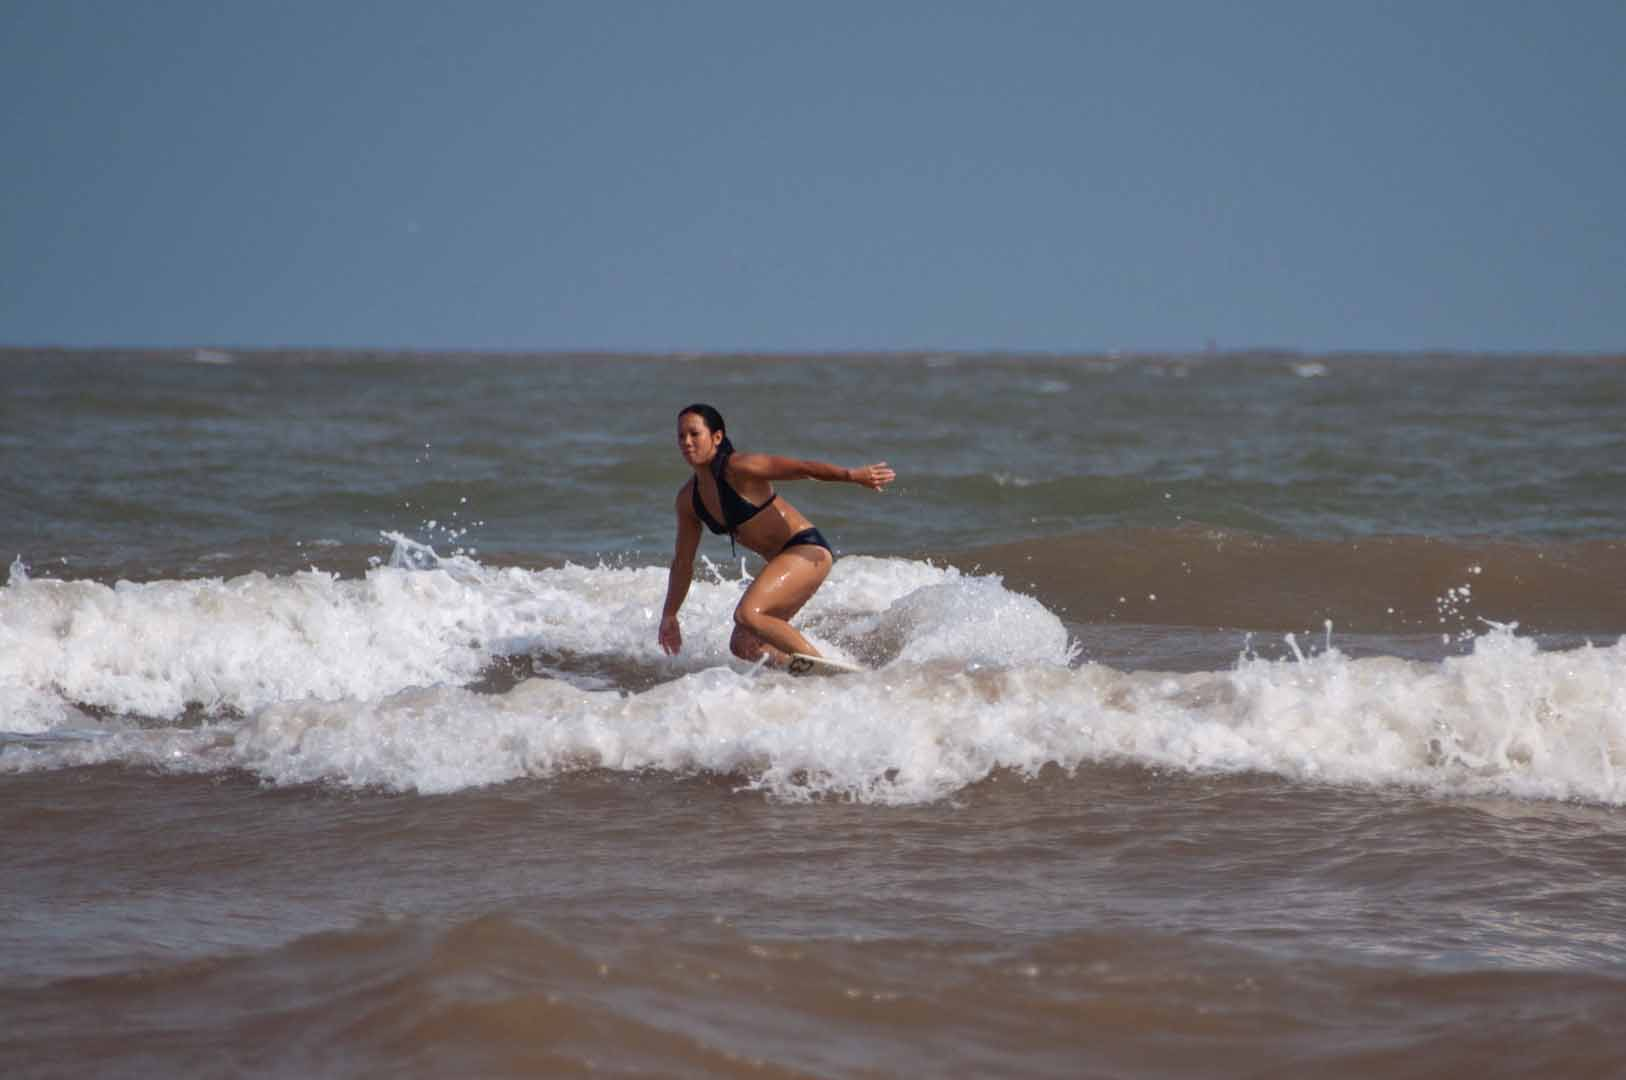 SurfsideJuly2_20150702_115